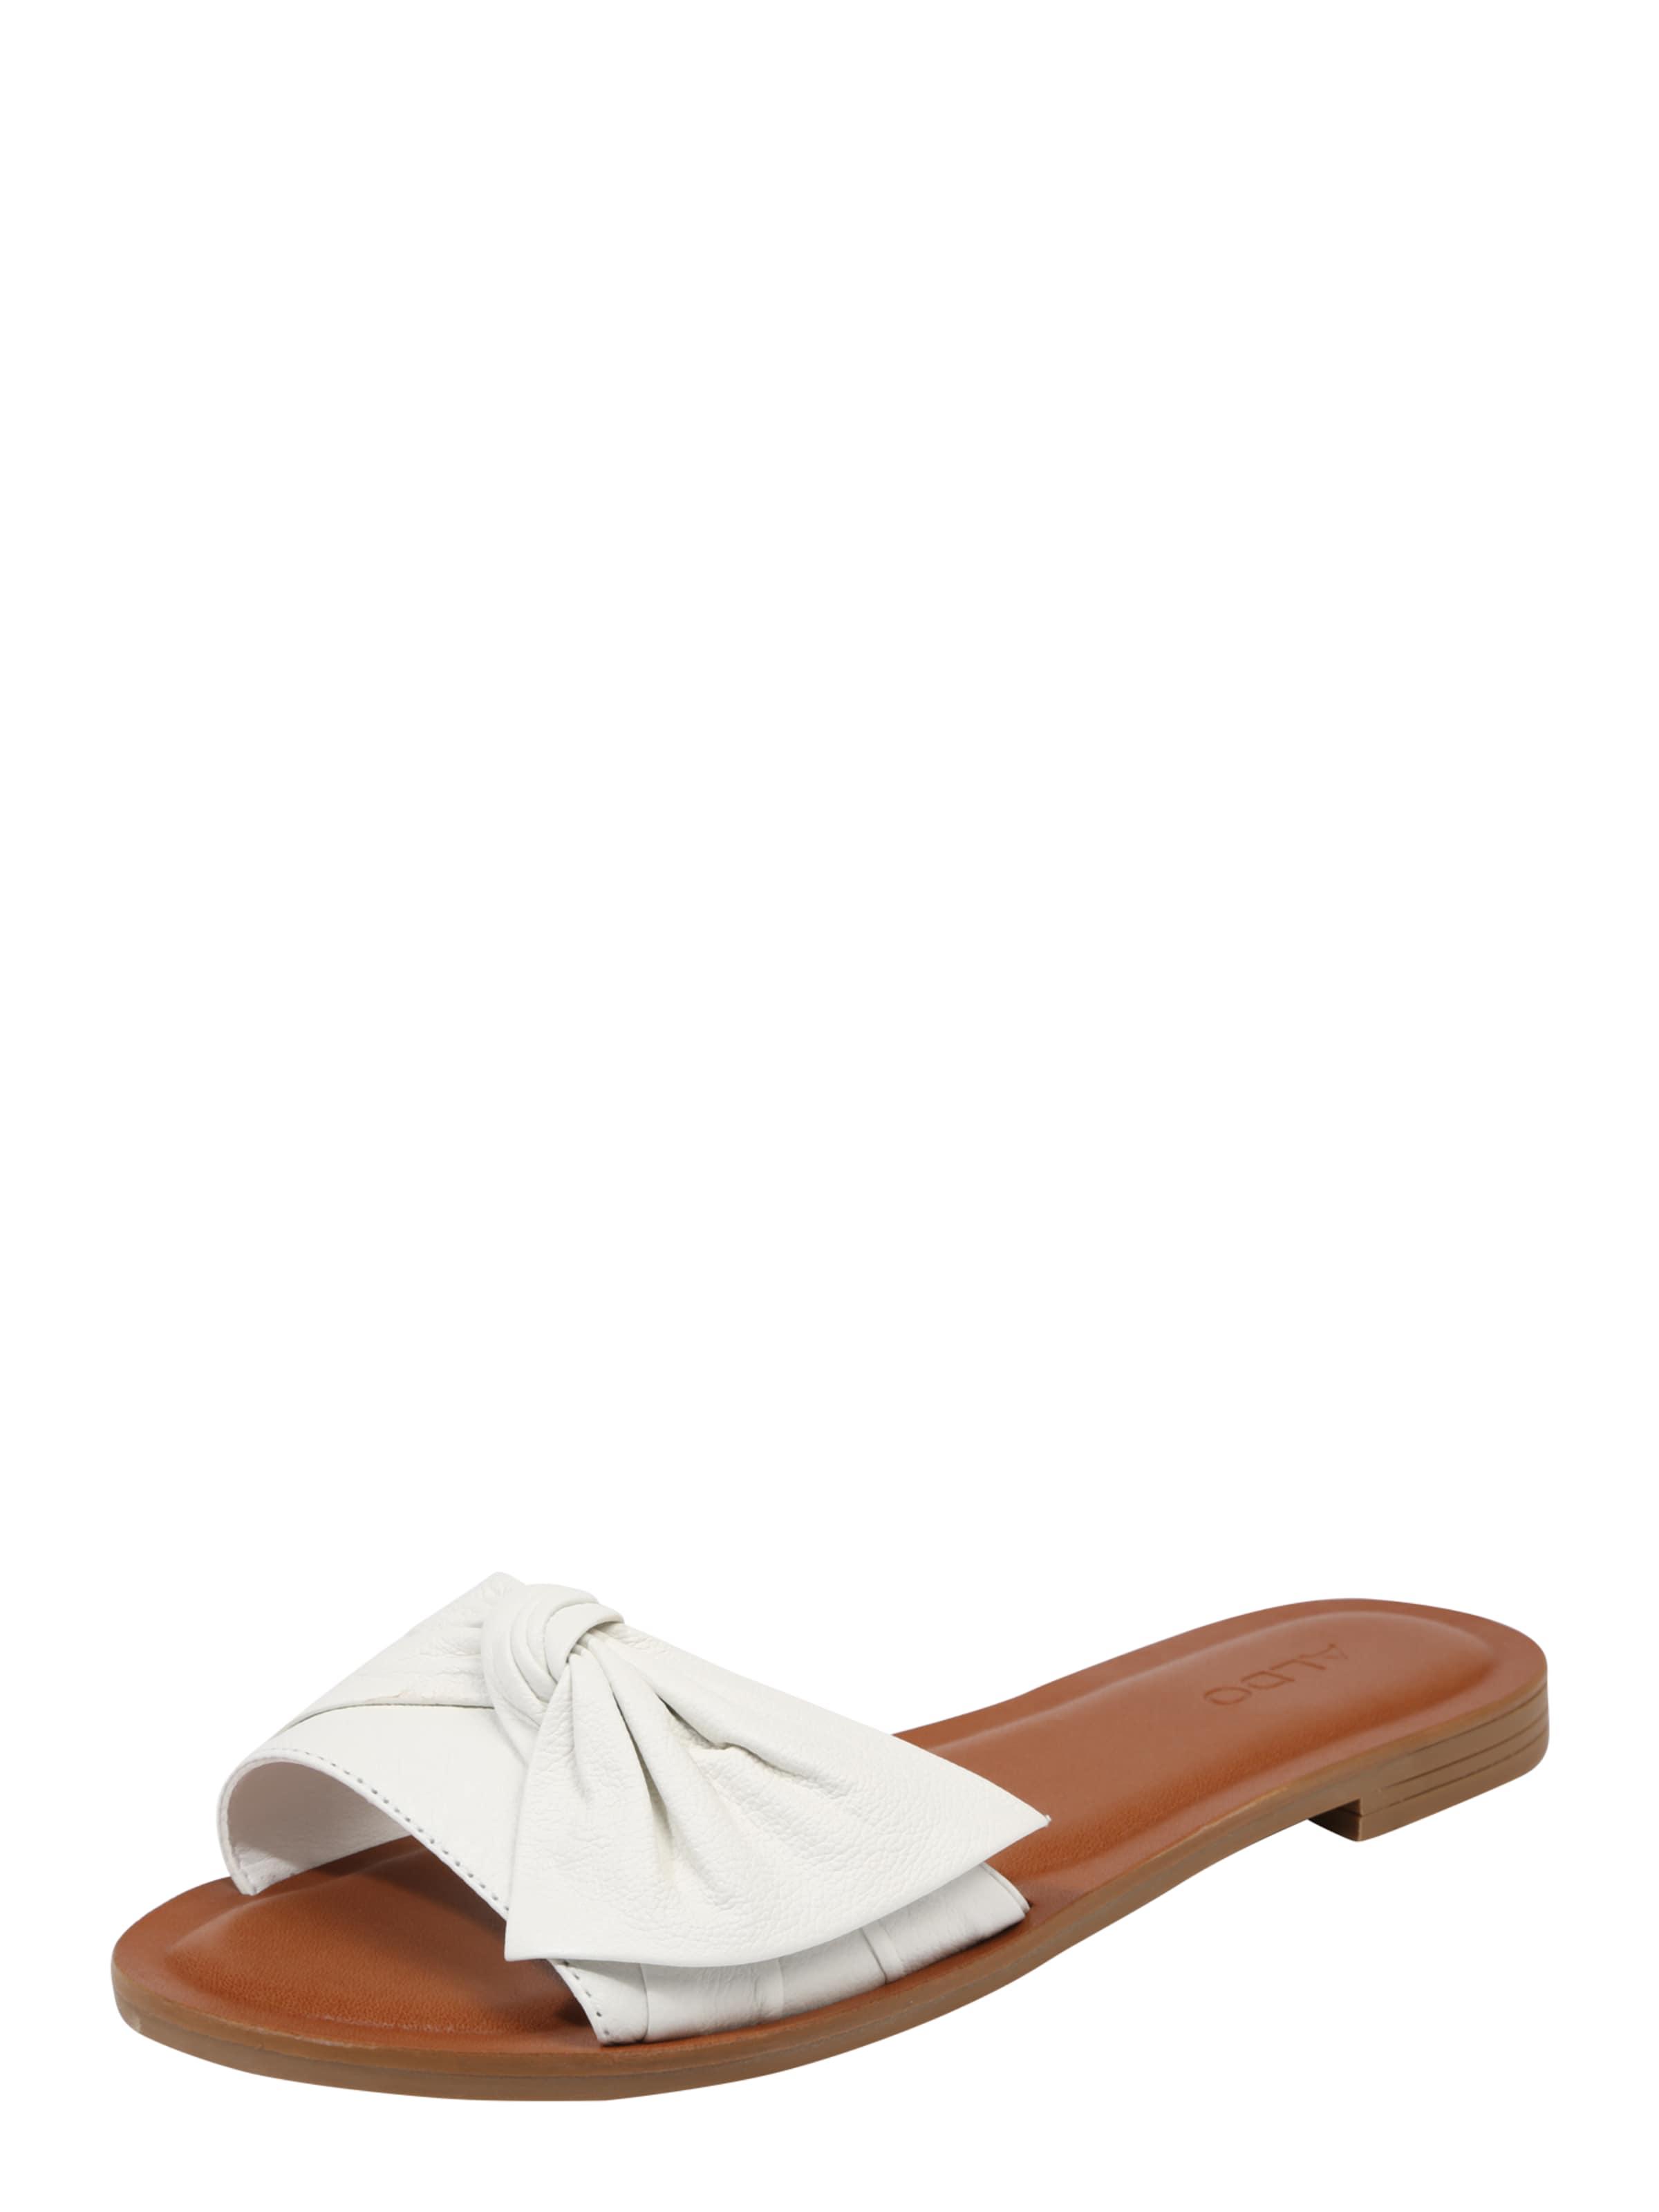 ALDO Sandalen ENROELIA Verschleißfeste billige Schuhe